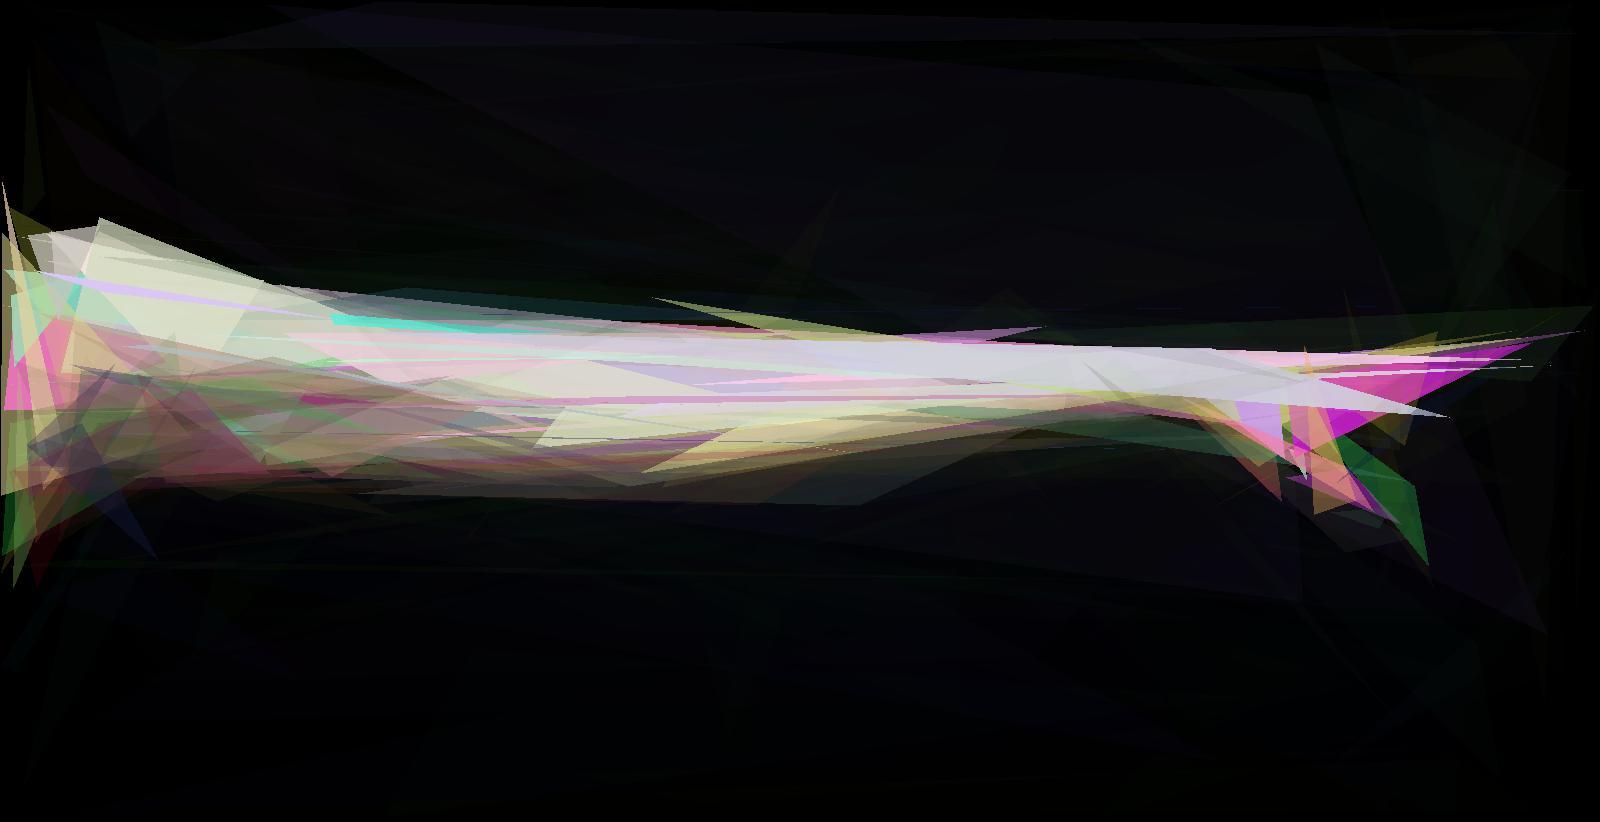 generation 854762-97.345518_per_cent-287_brush_strokes.jpg